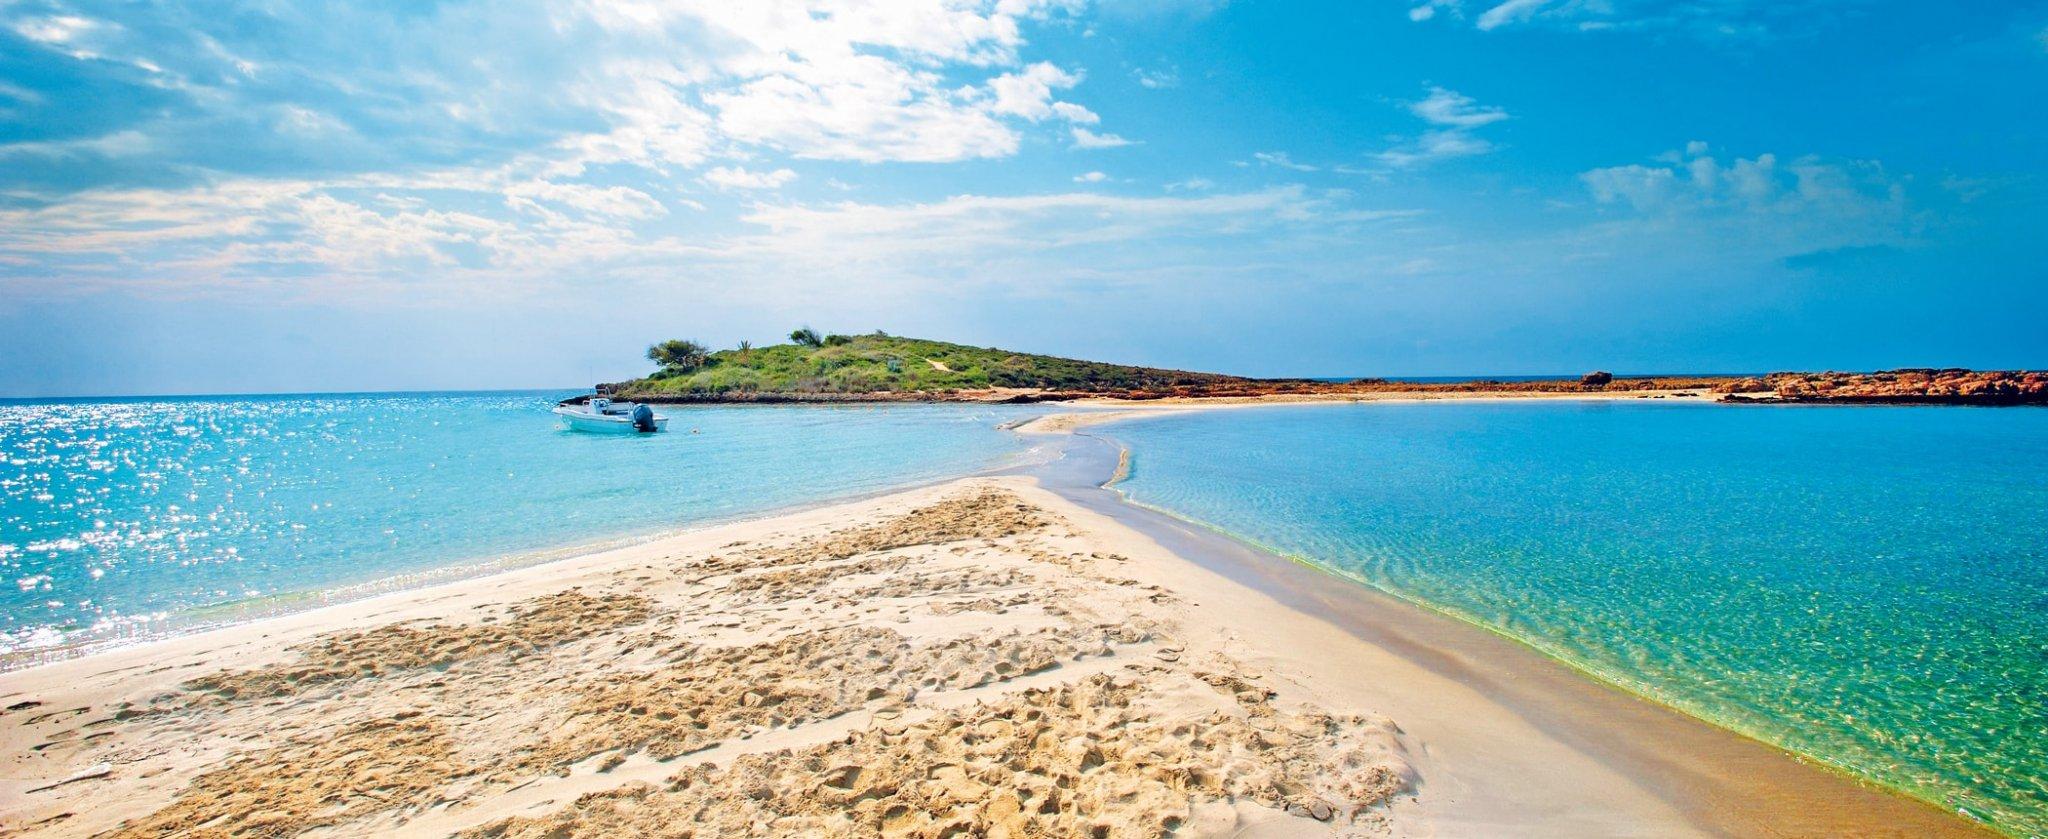 Кипр айя напа фото туристов